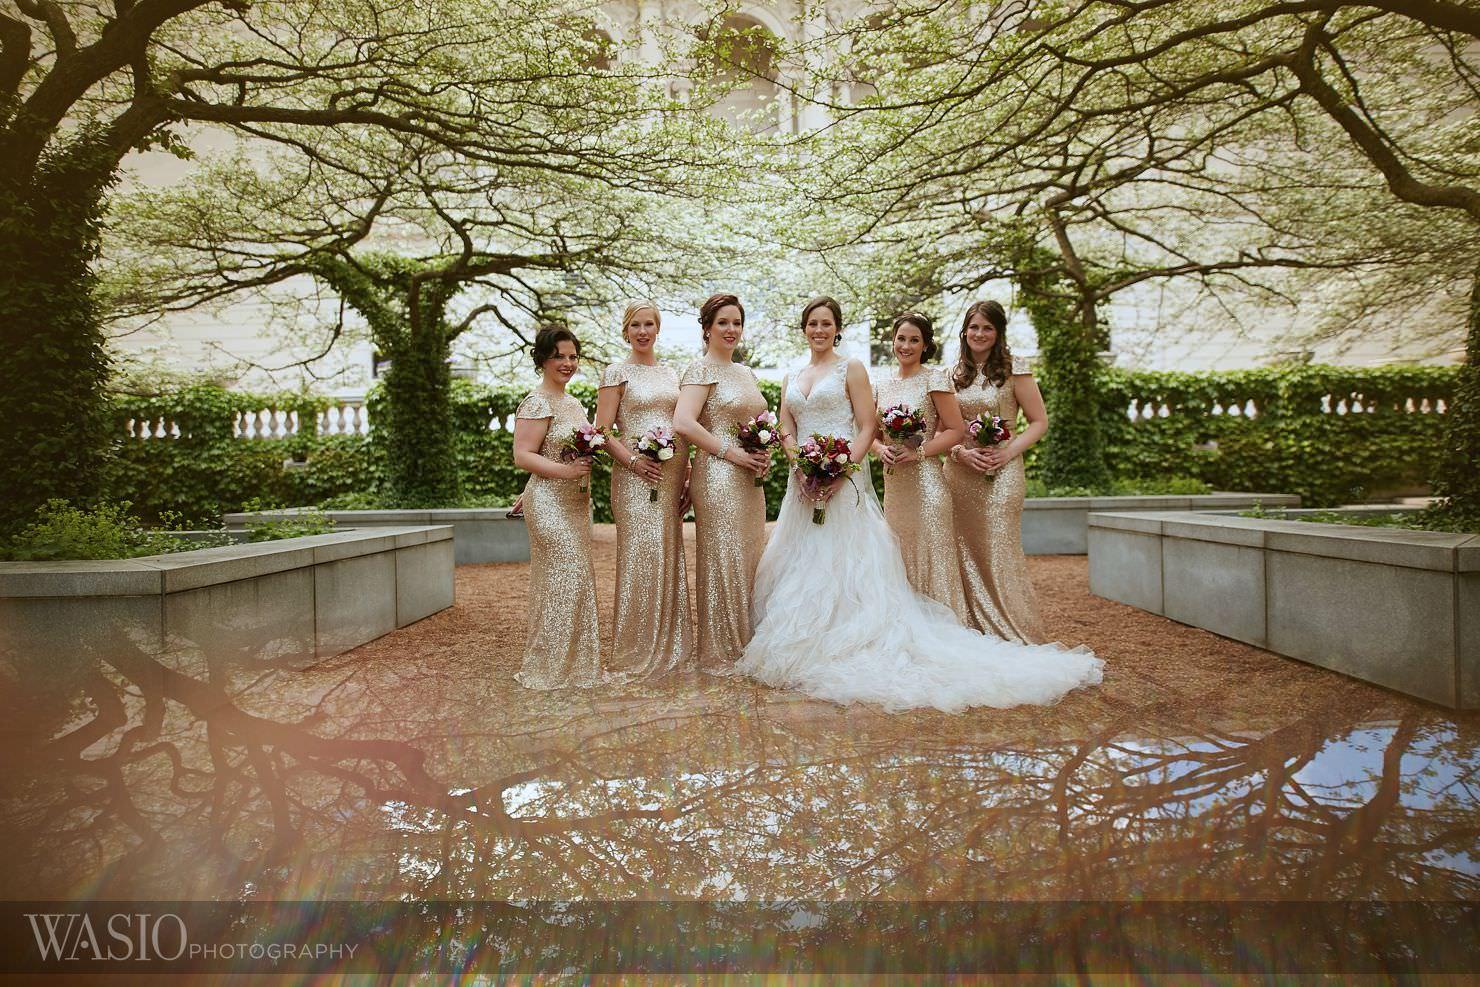 017_Lincoln-Park-Wedding_Dimphy-Mark__O3A9766 Lincoln Park Wedding - Dimphy & Mark